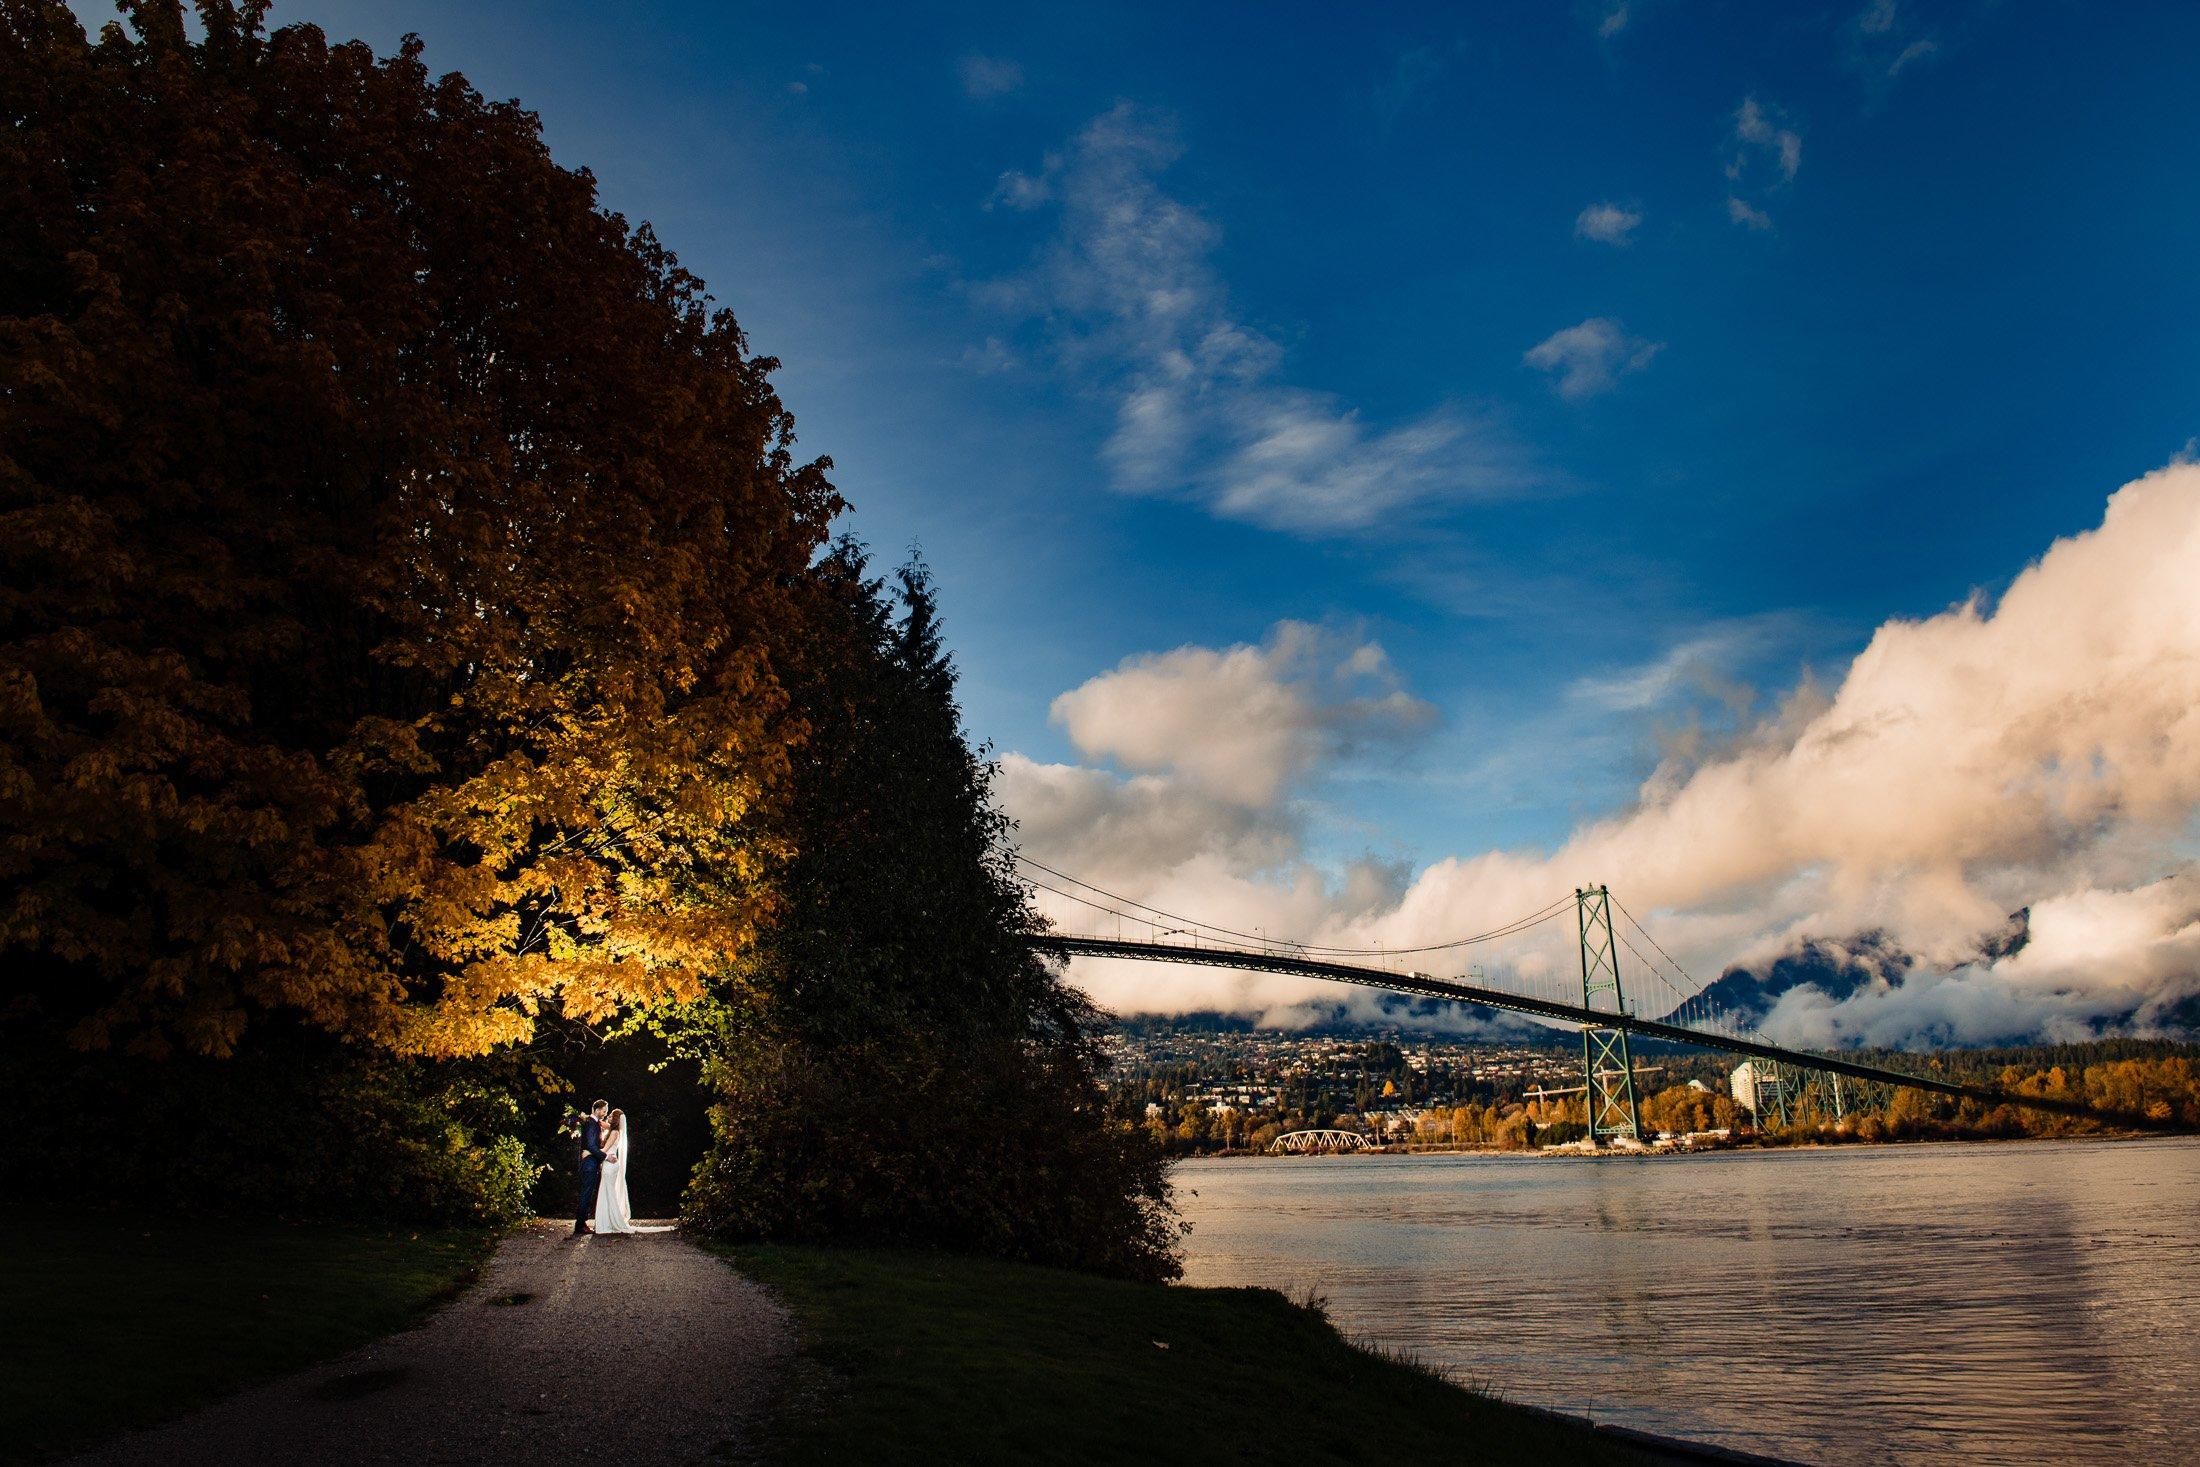 037 - lionsgate bridge seawall wedding photos